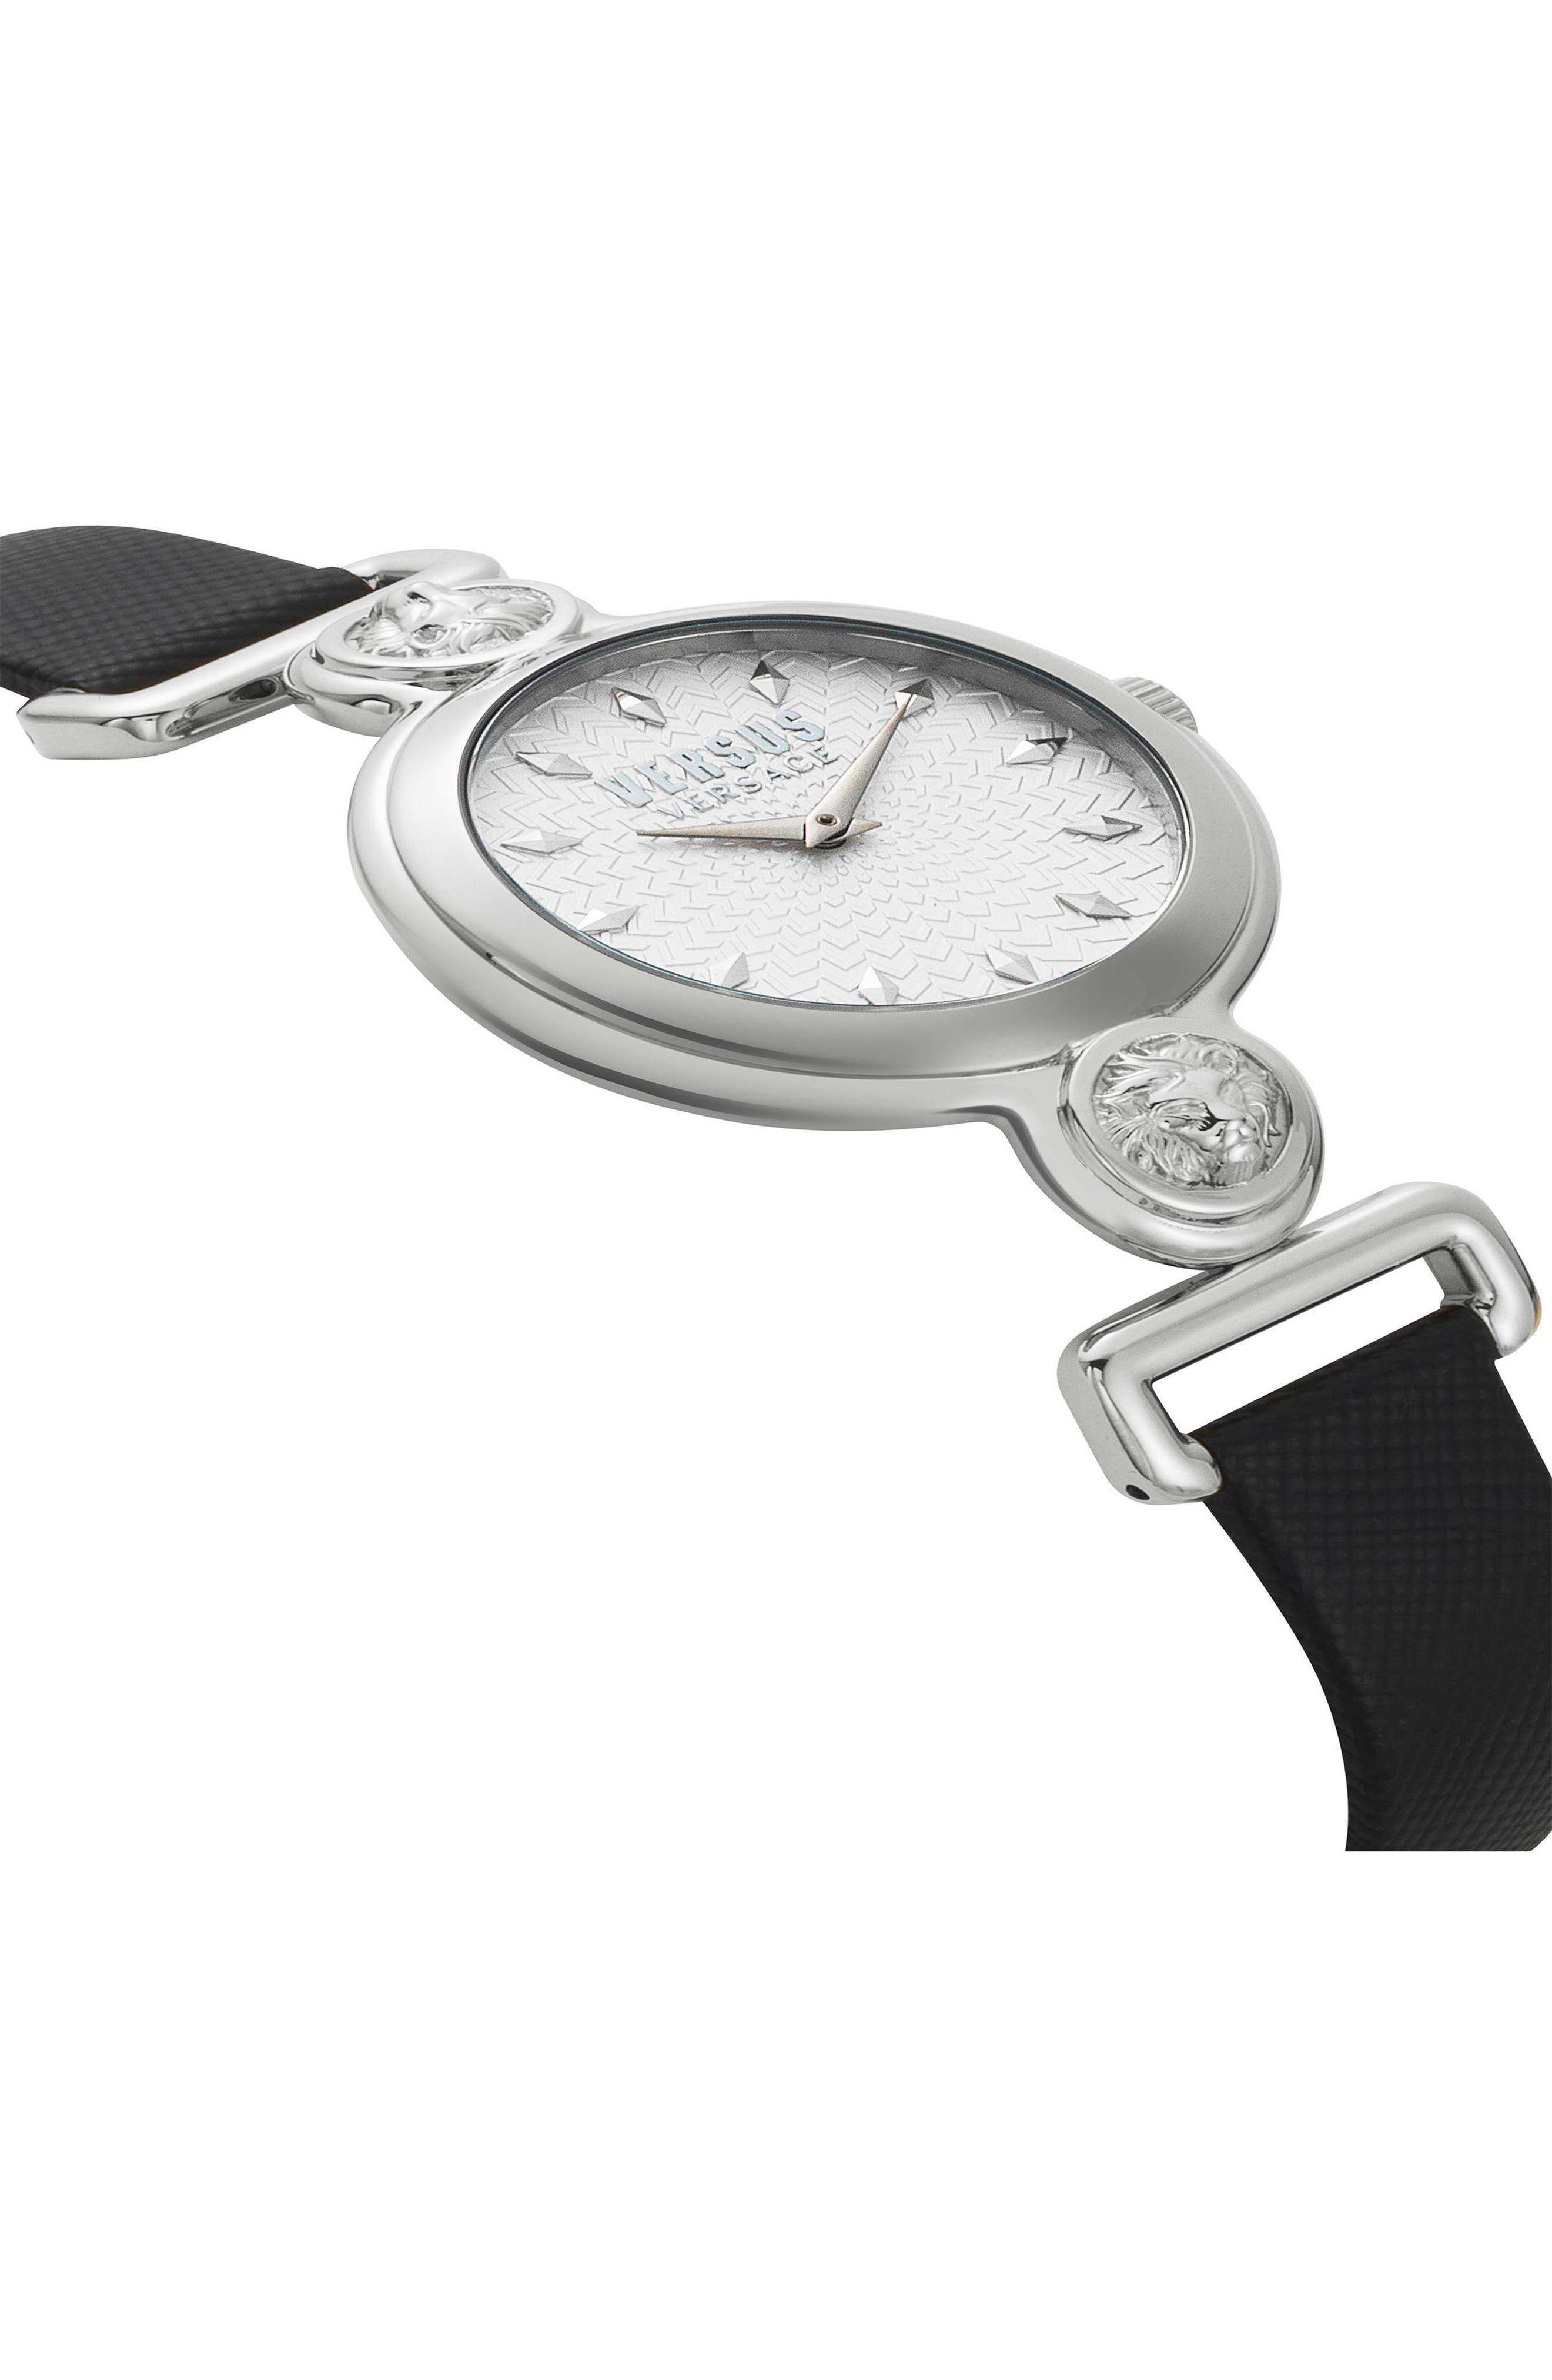 Sunnyridge Leather Strap Watch, 34mm,                             Alternate thumbnail 3, color,                             BLACK/ SILVER